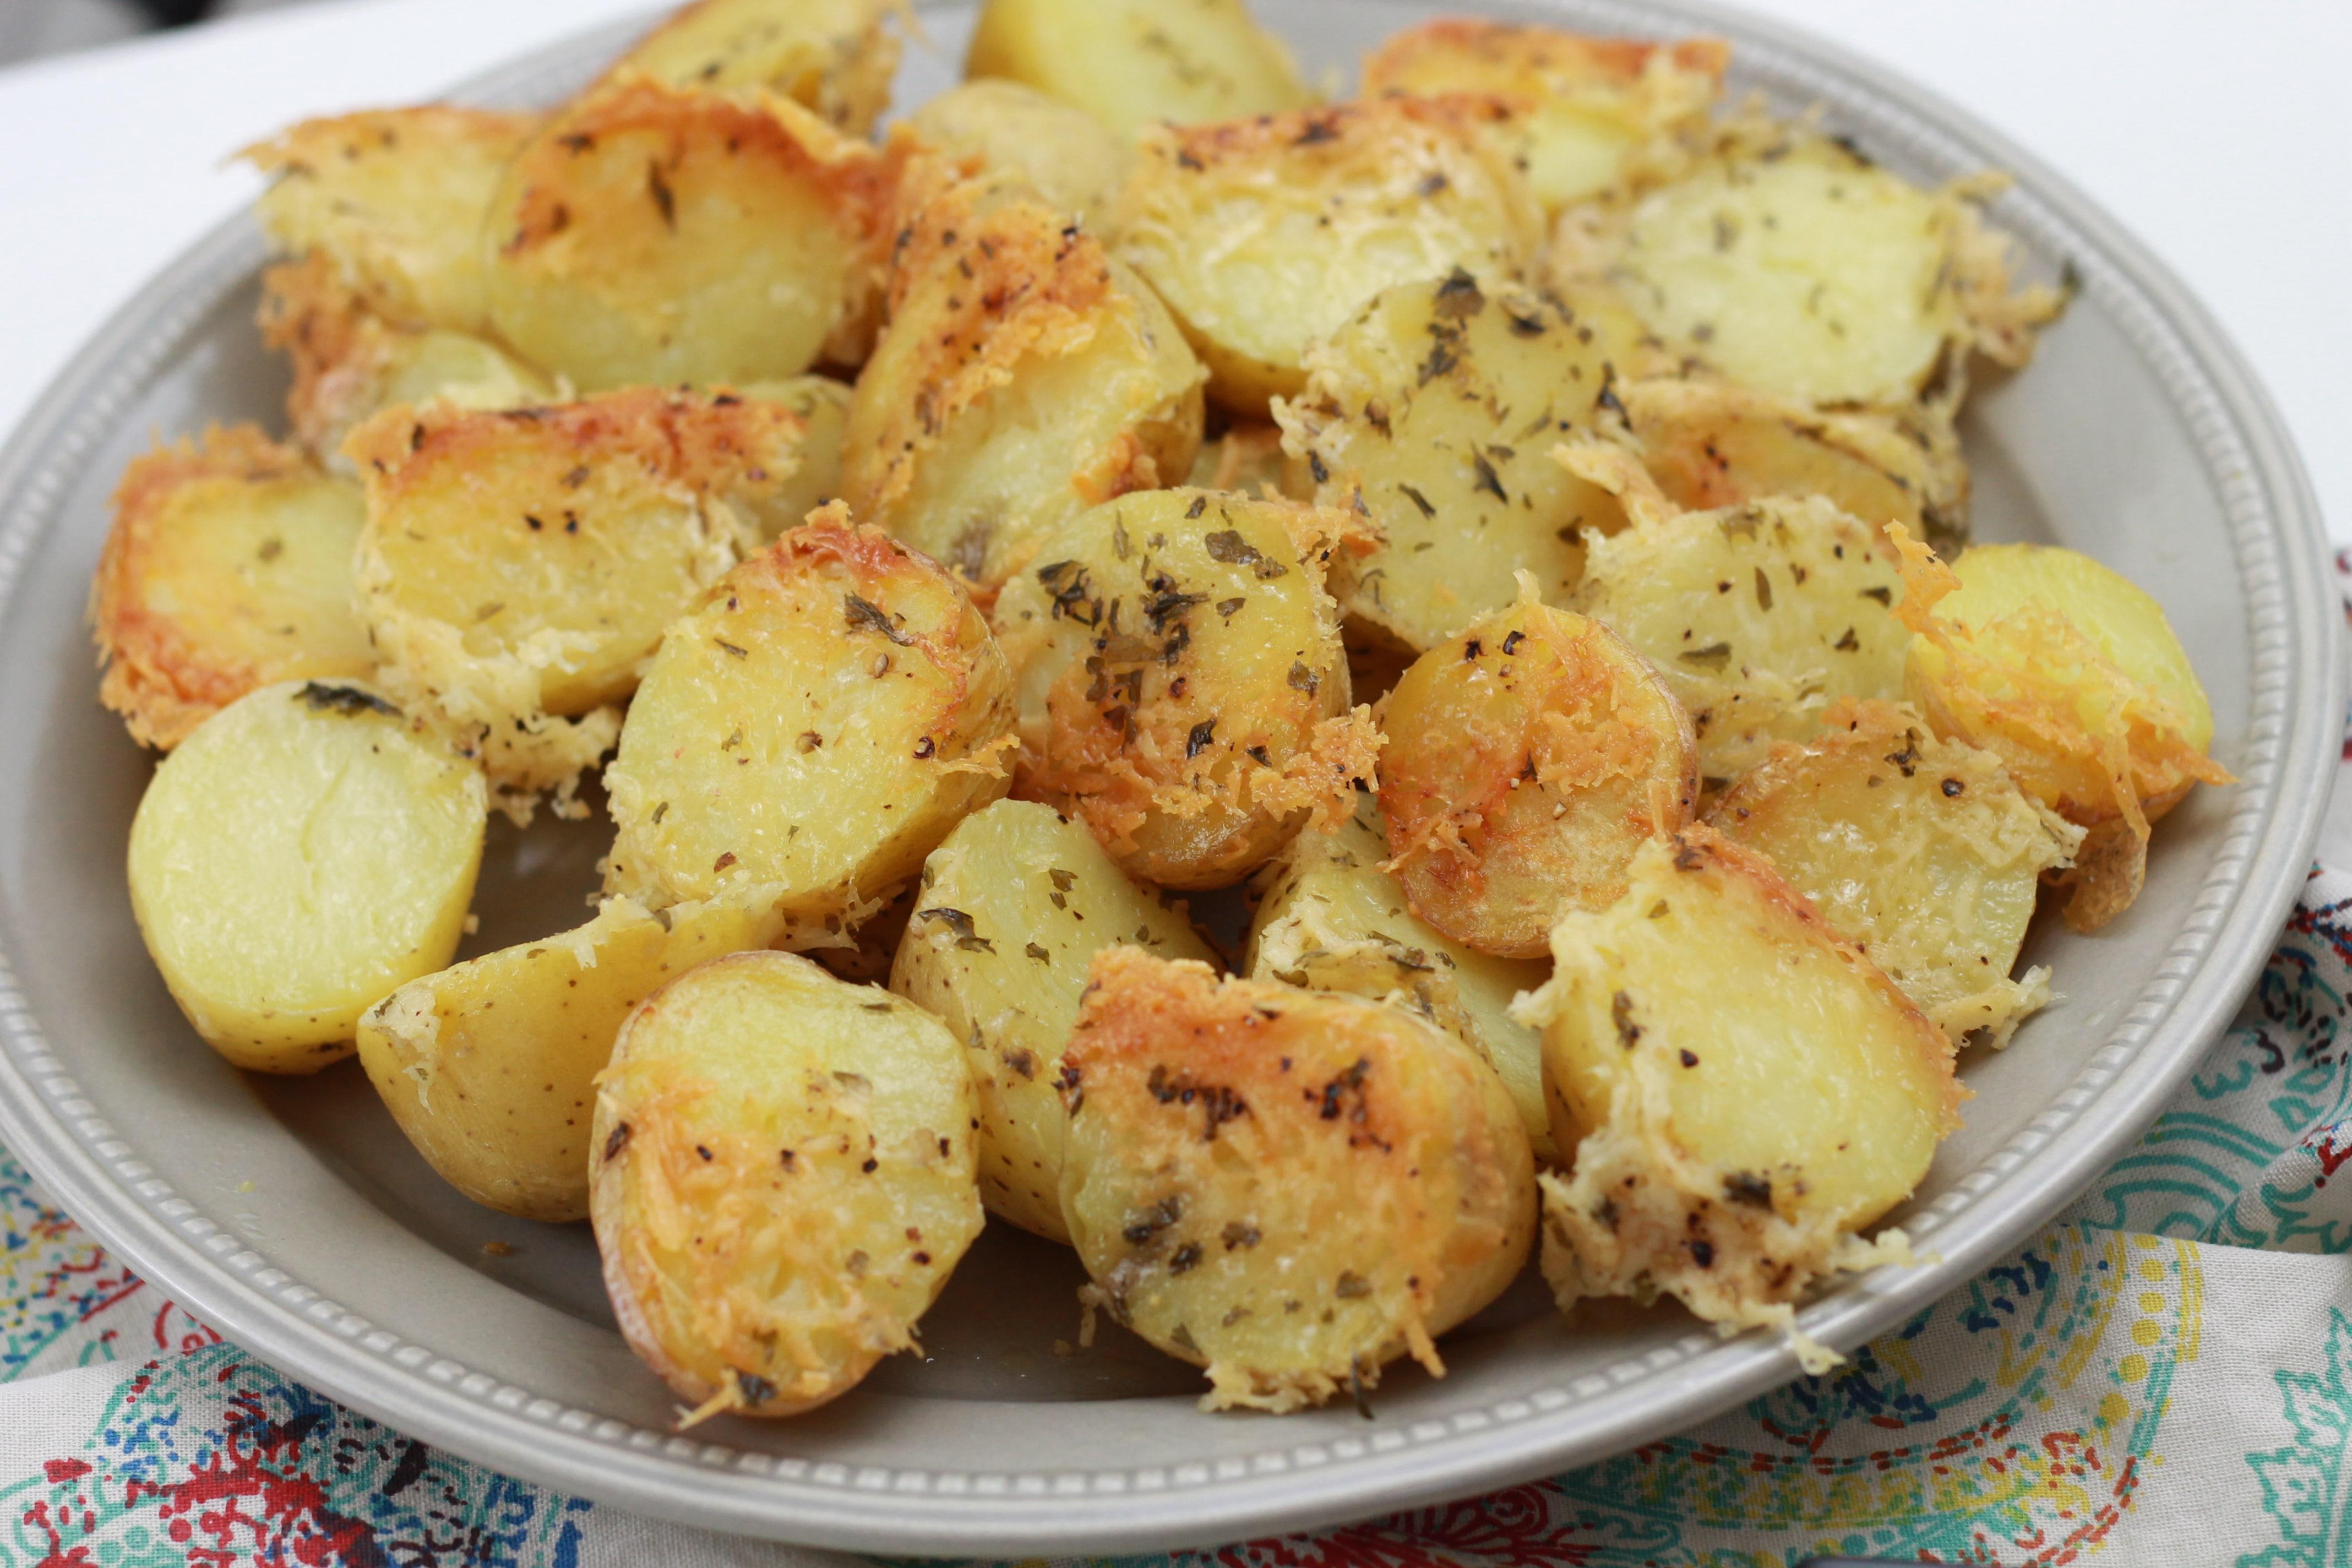 Baked Parmesan Potatoes